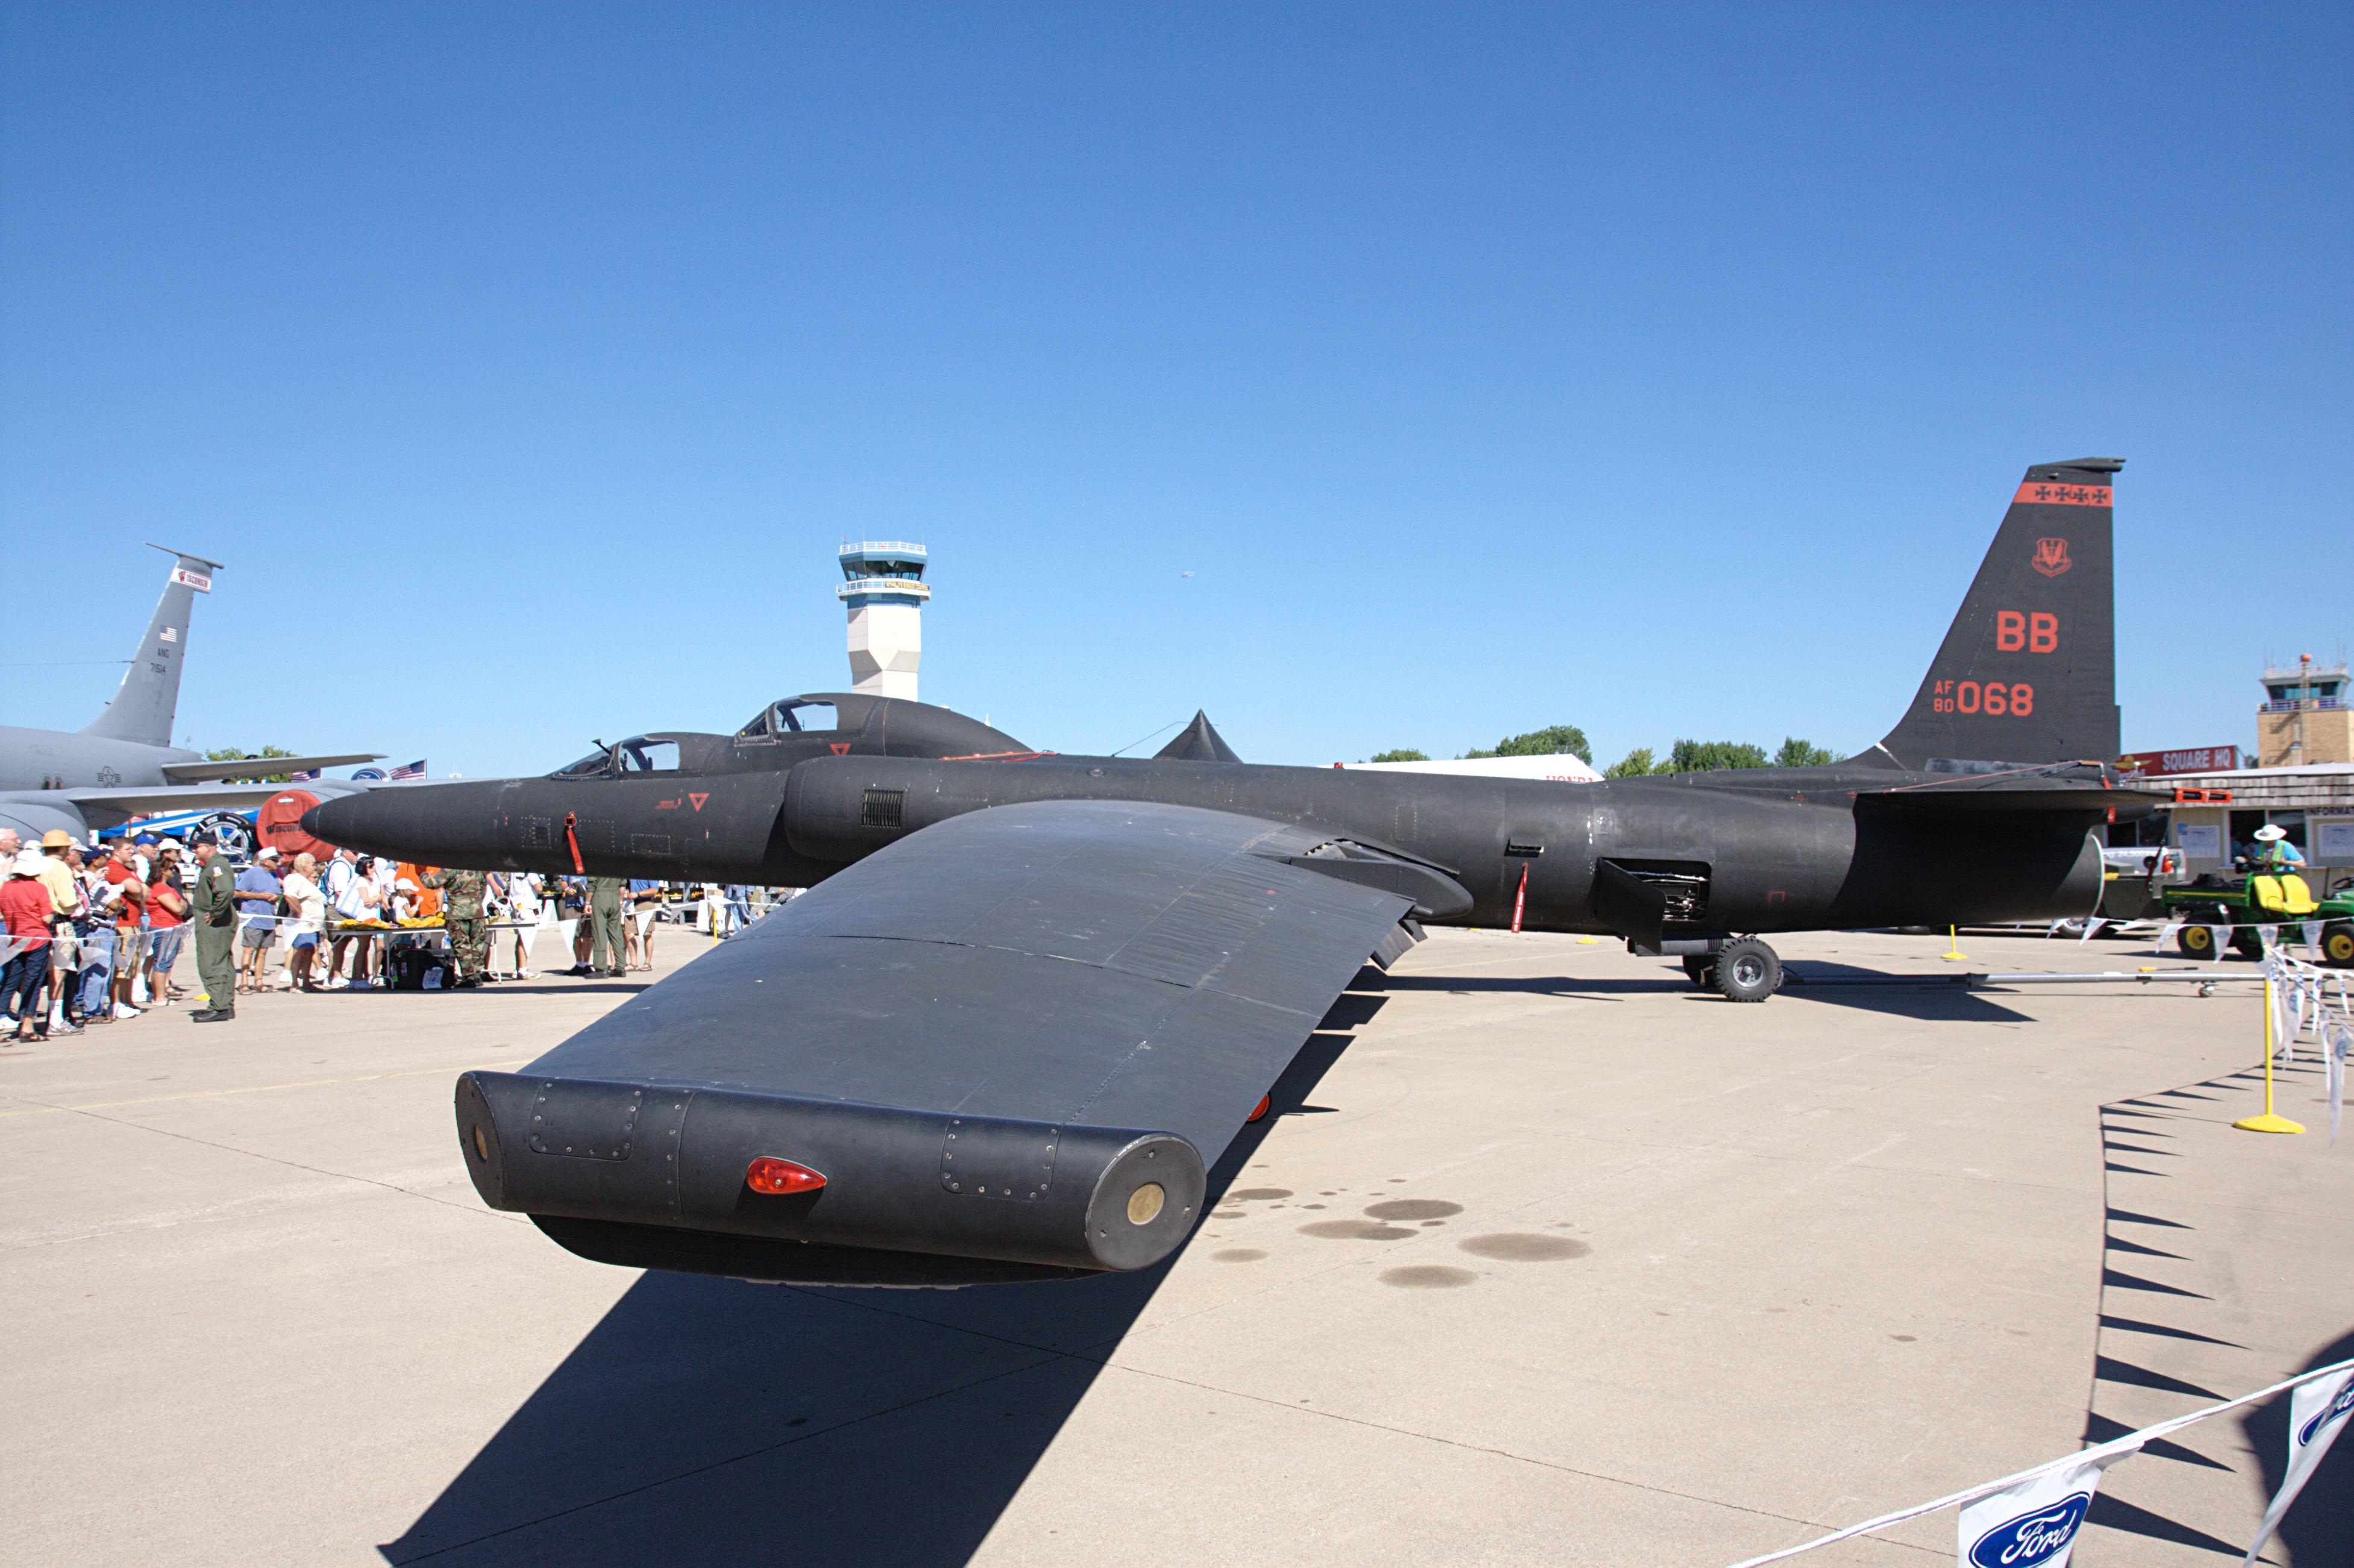 https://upload.wikimedia.org/wikipedia/commons/b/bf/Lockheed_U-2_TR-1B.jpg